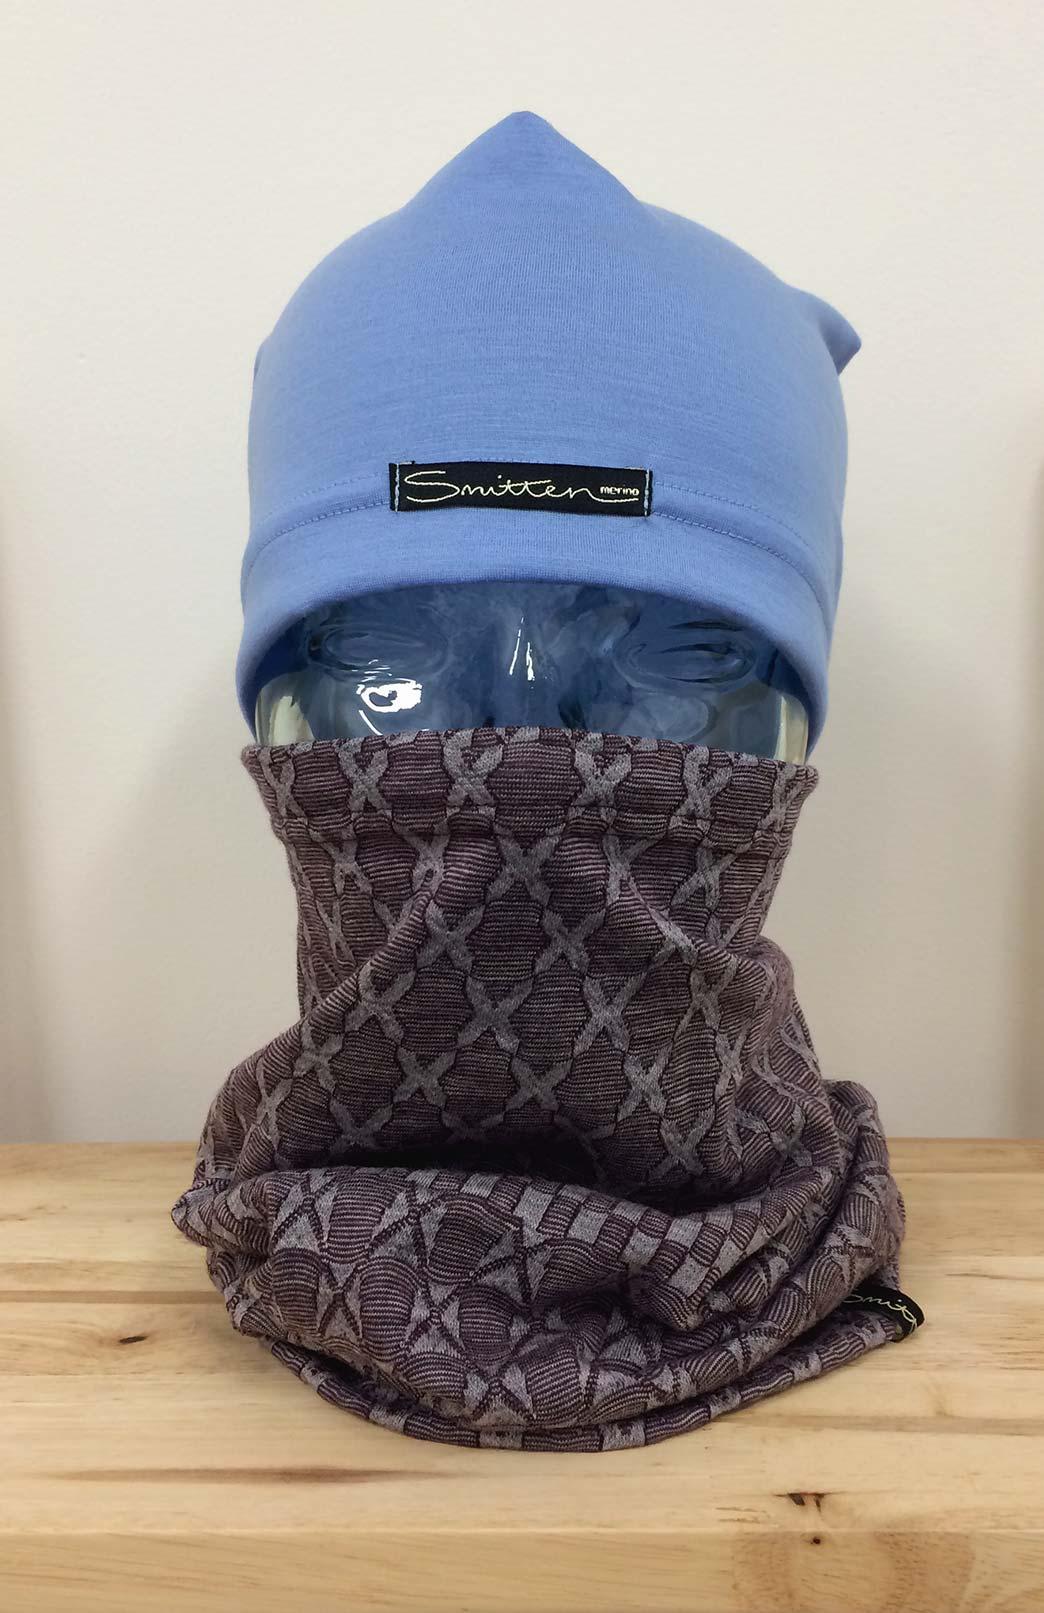 Thermal Neck Warmer - Merino Wool Multi Purpose Thermal Neck Warmer, Snood, Buff - Smitten Merino Tasmania Australia